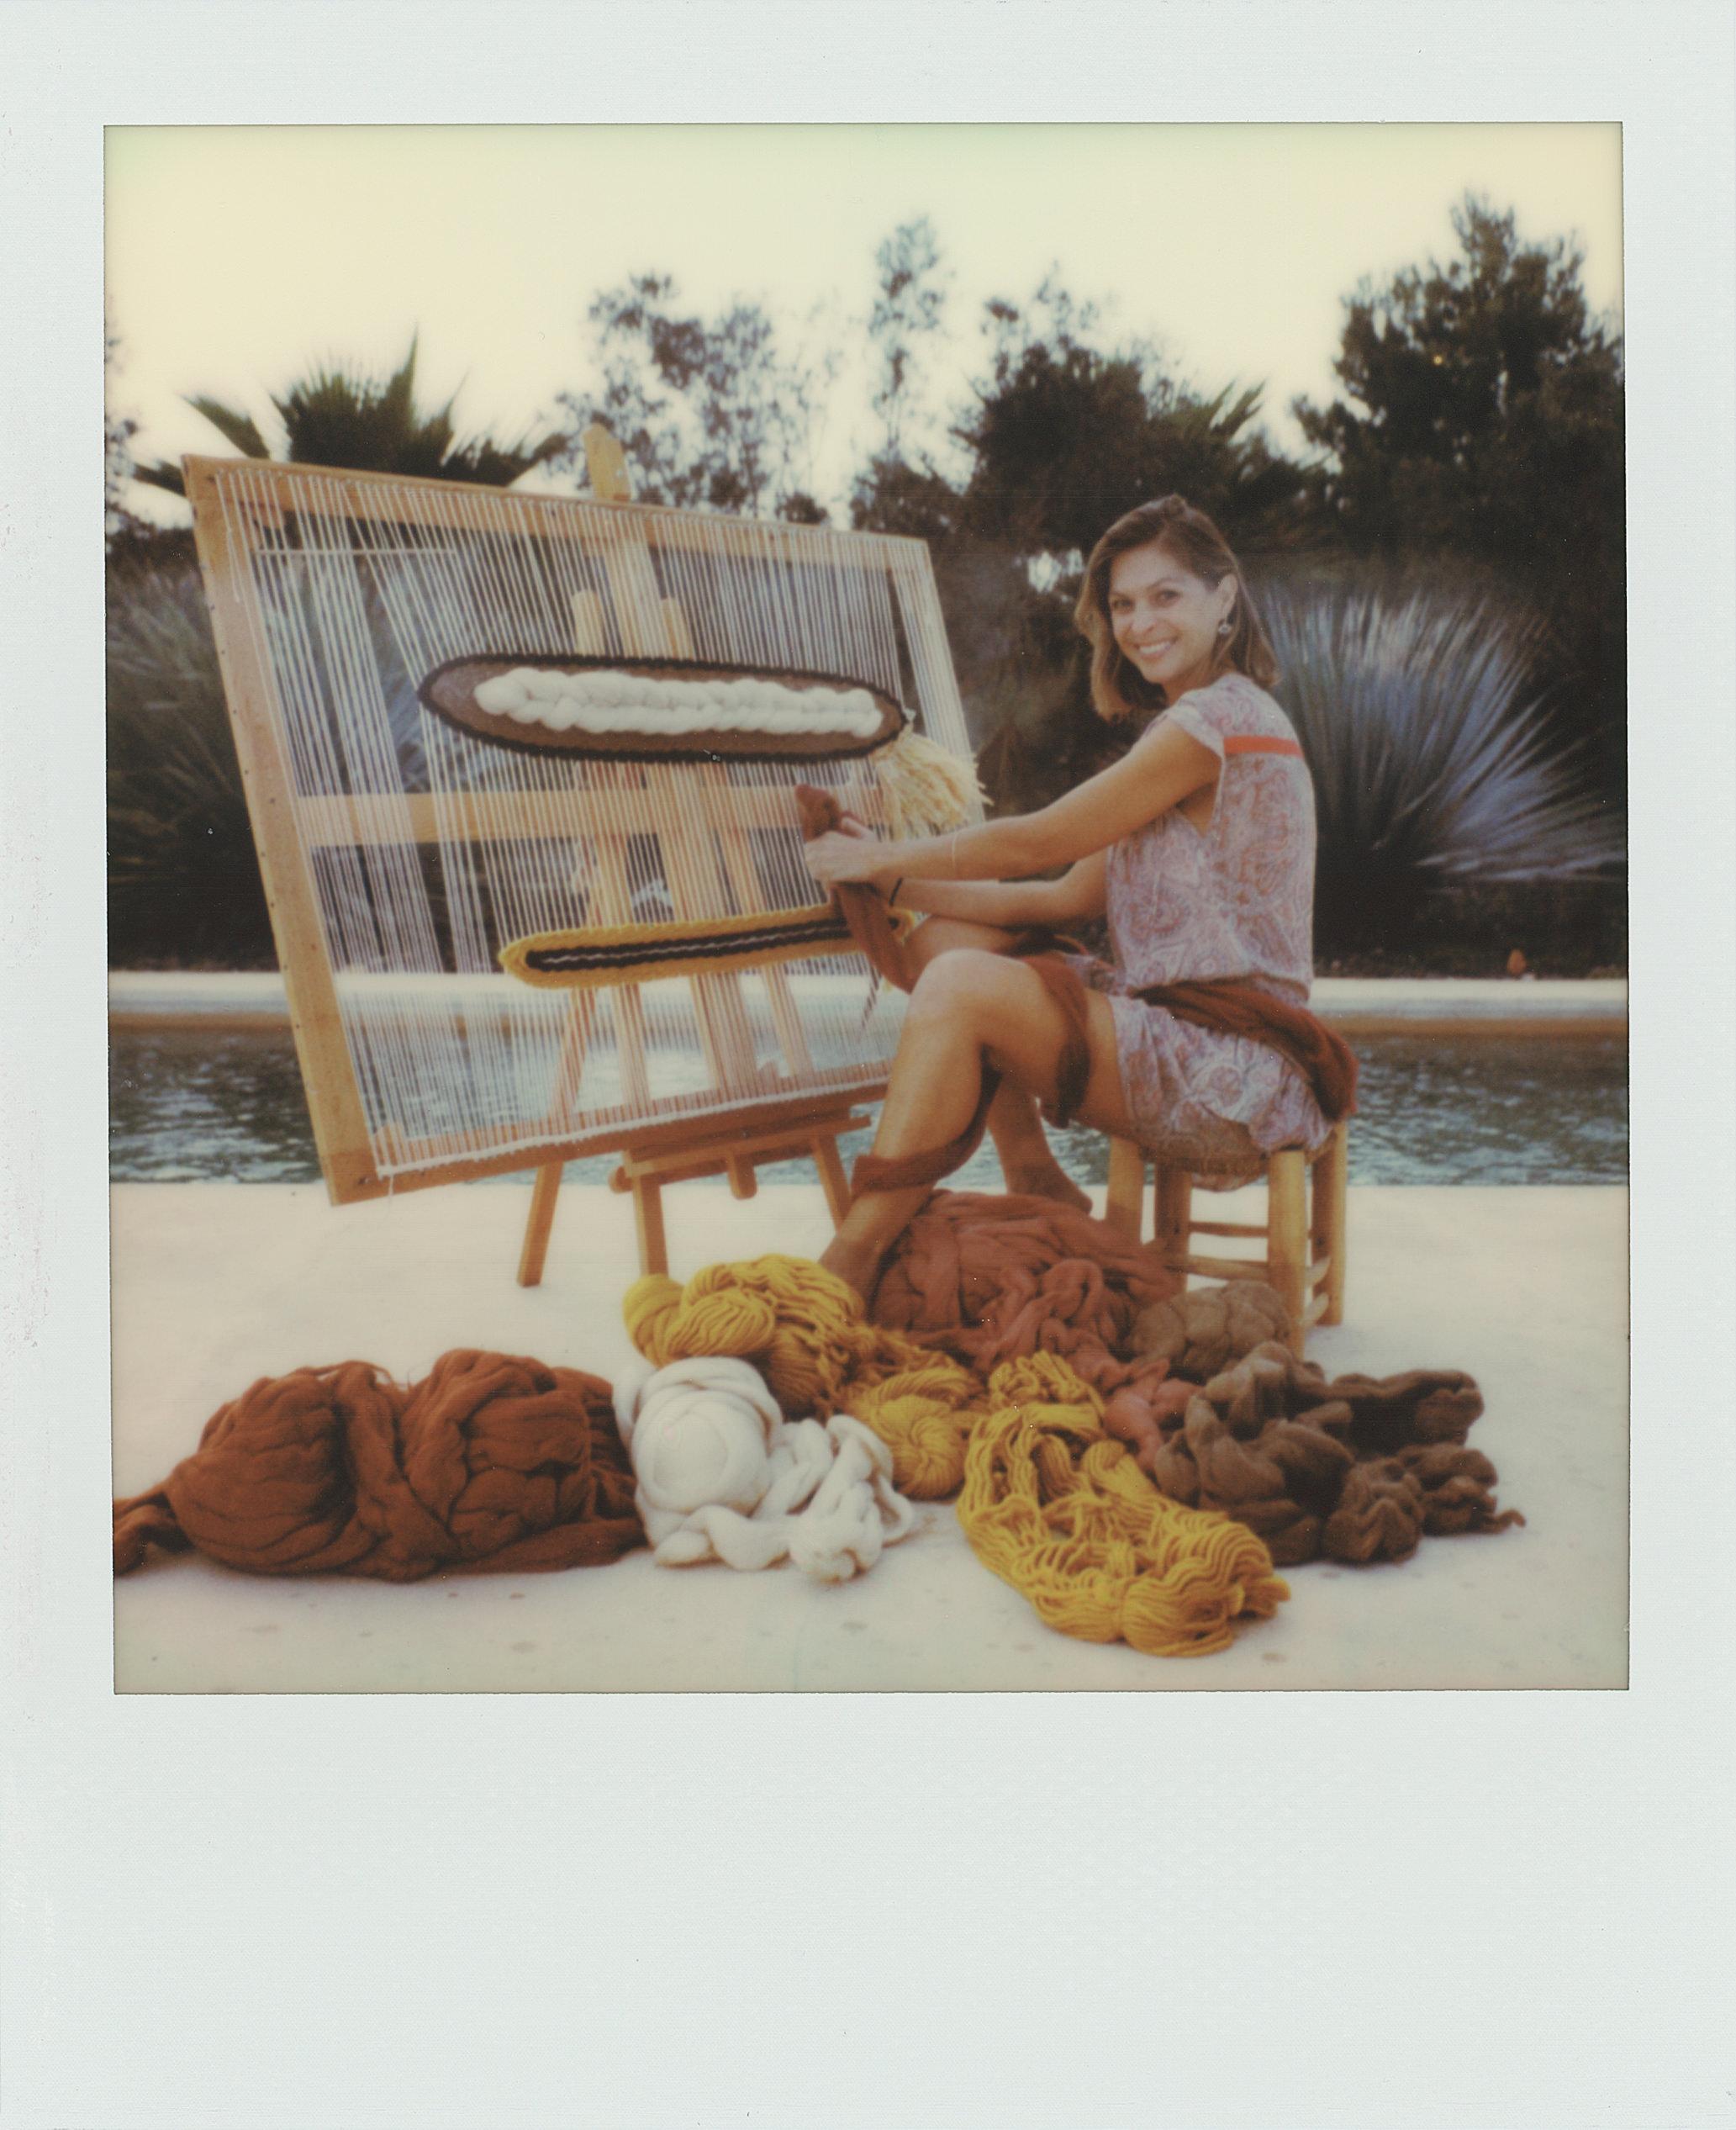 Aline_de_la_Forcade_Polaroid-2